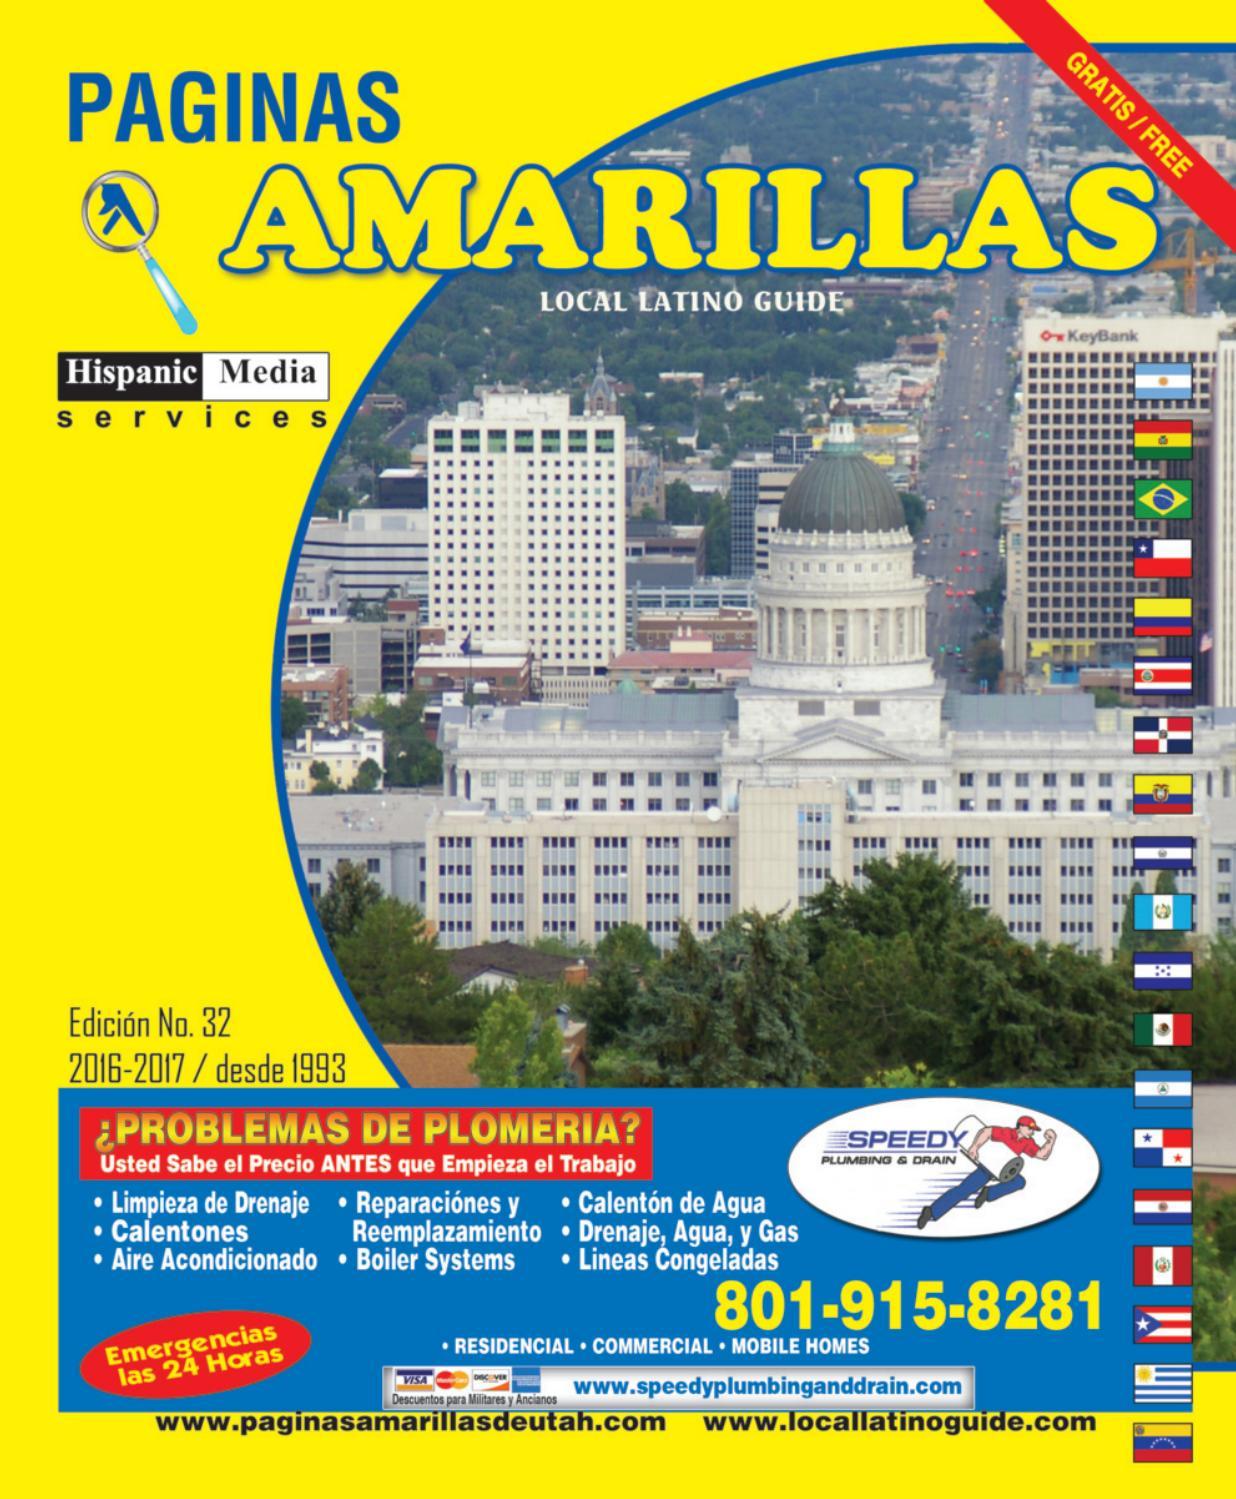 Guia local latina 2016 by Paginas Amarillas - Guia Local Latina - issuu